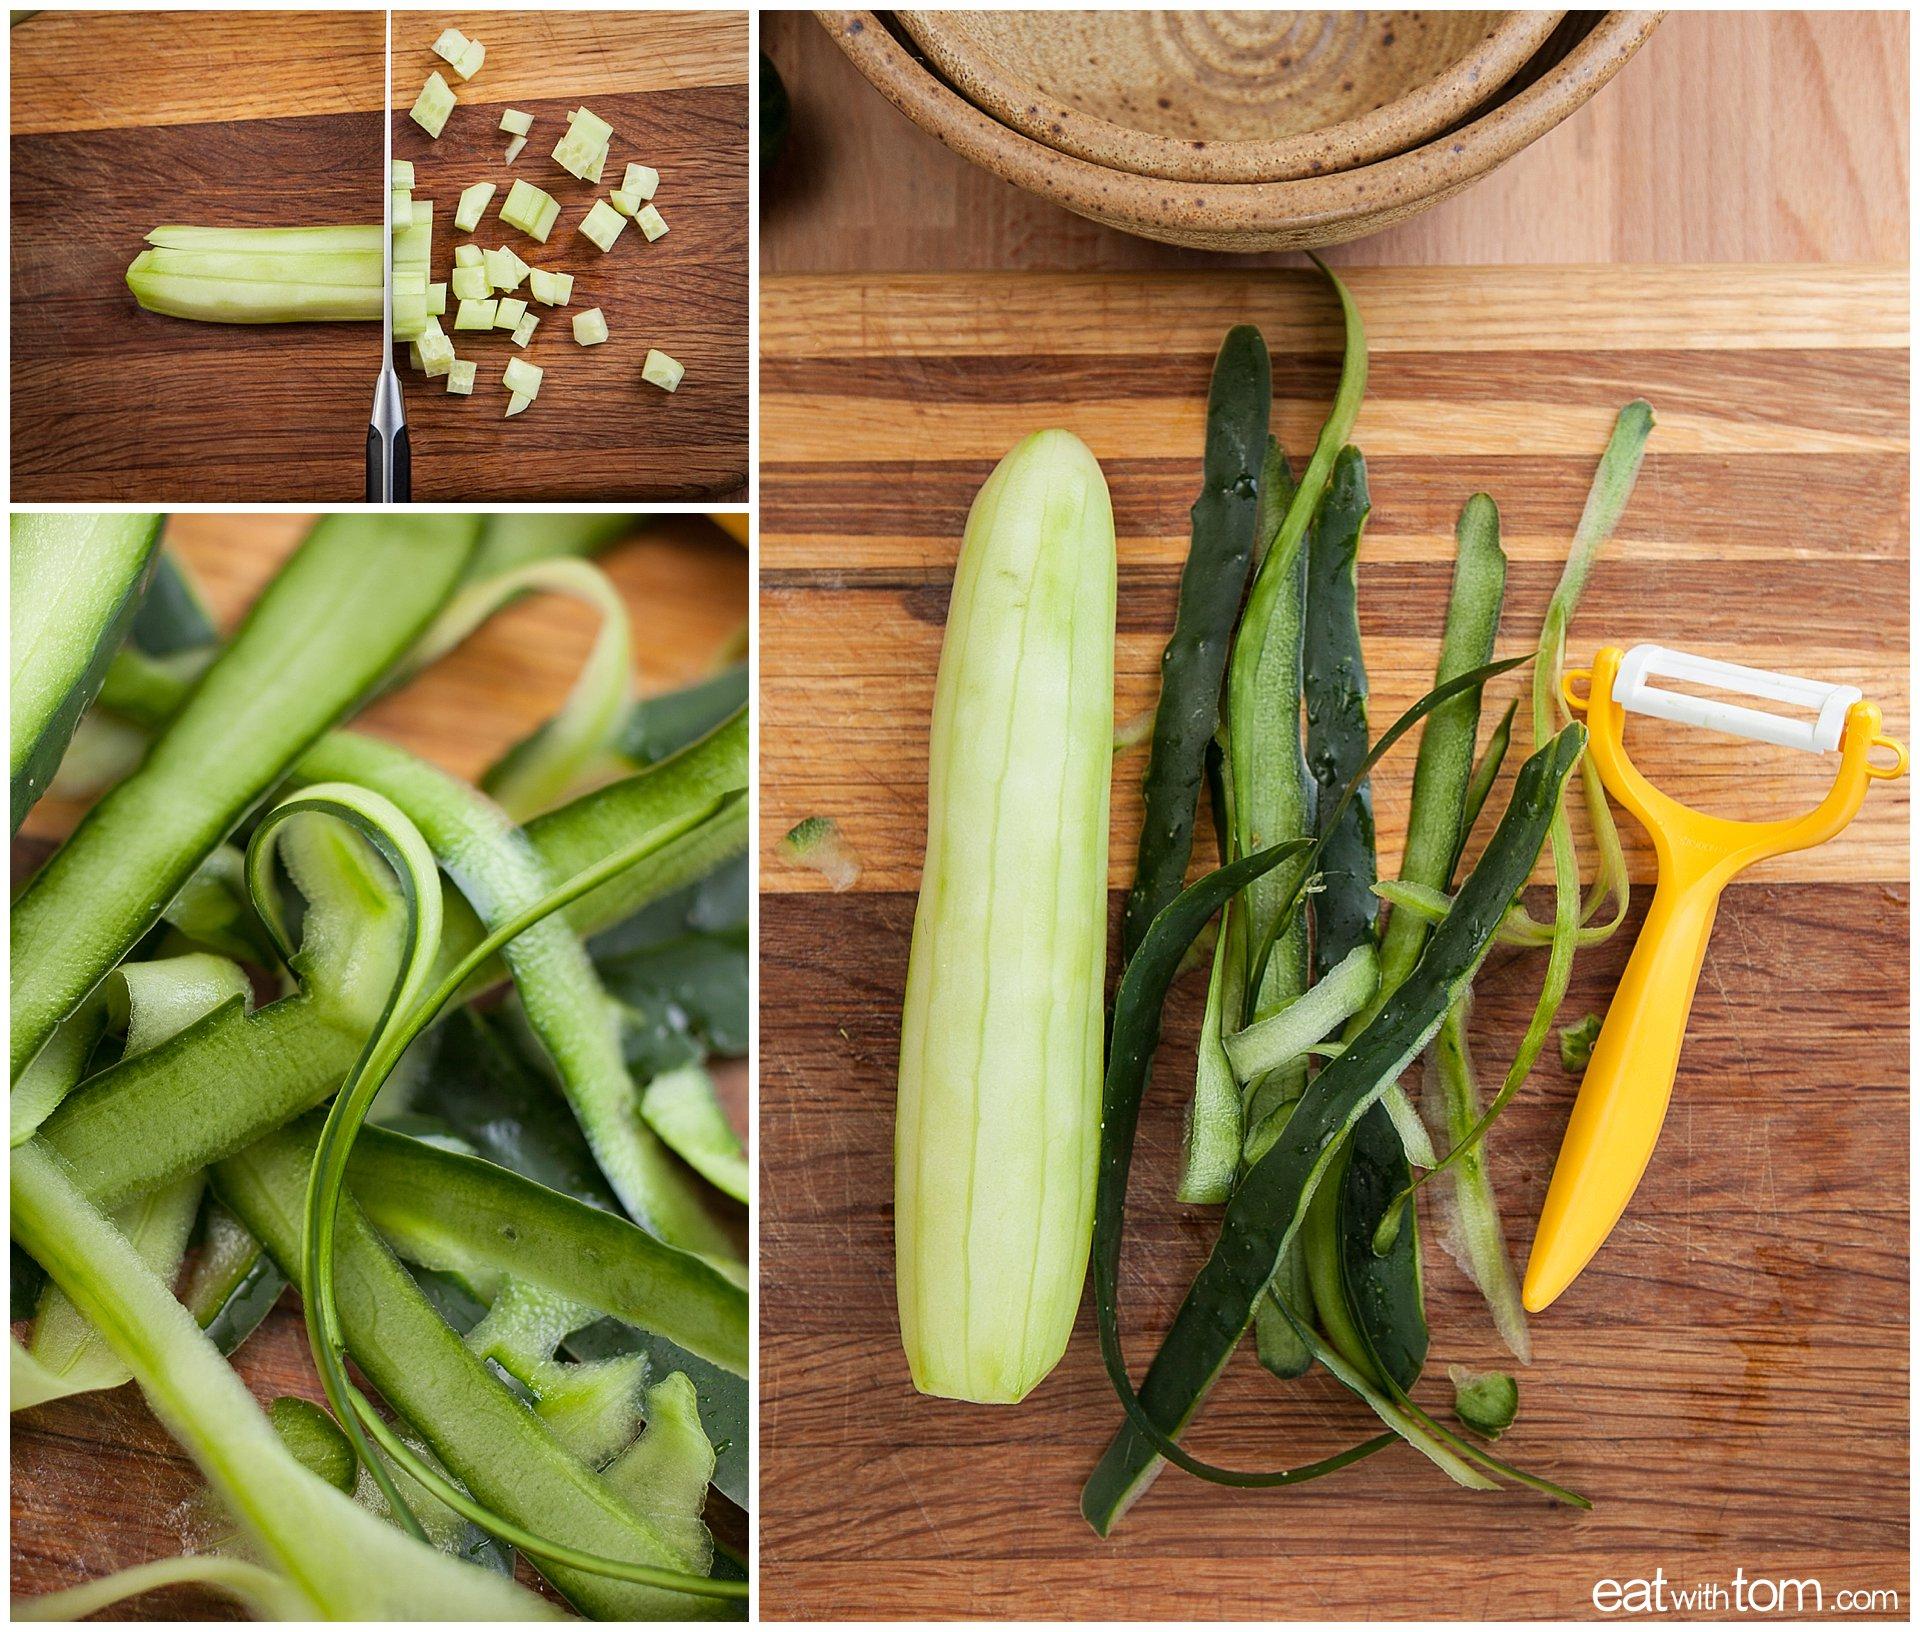 peel cucumbers with kyocera ceramic peeler for quinoa breakfast recipe